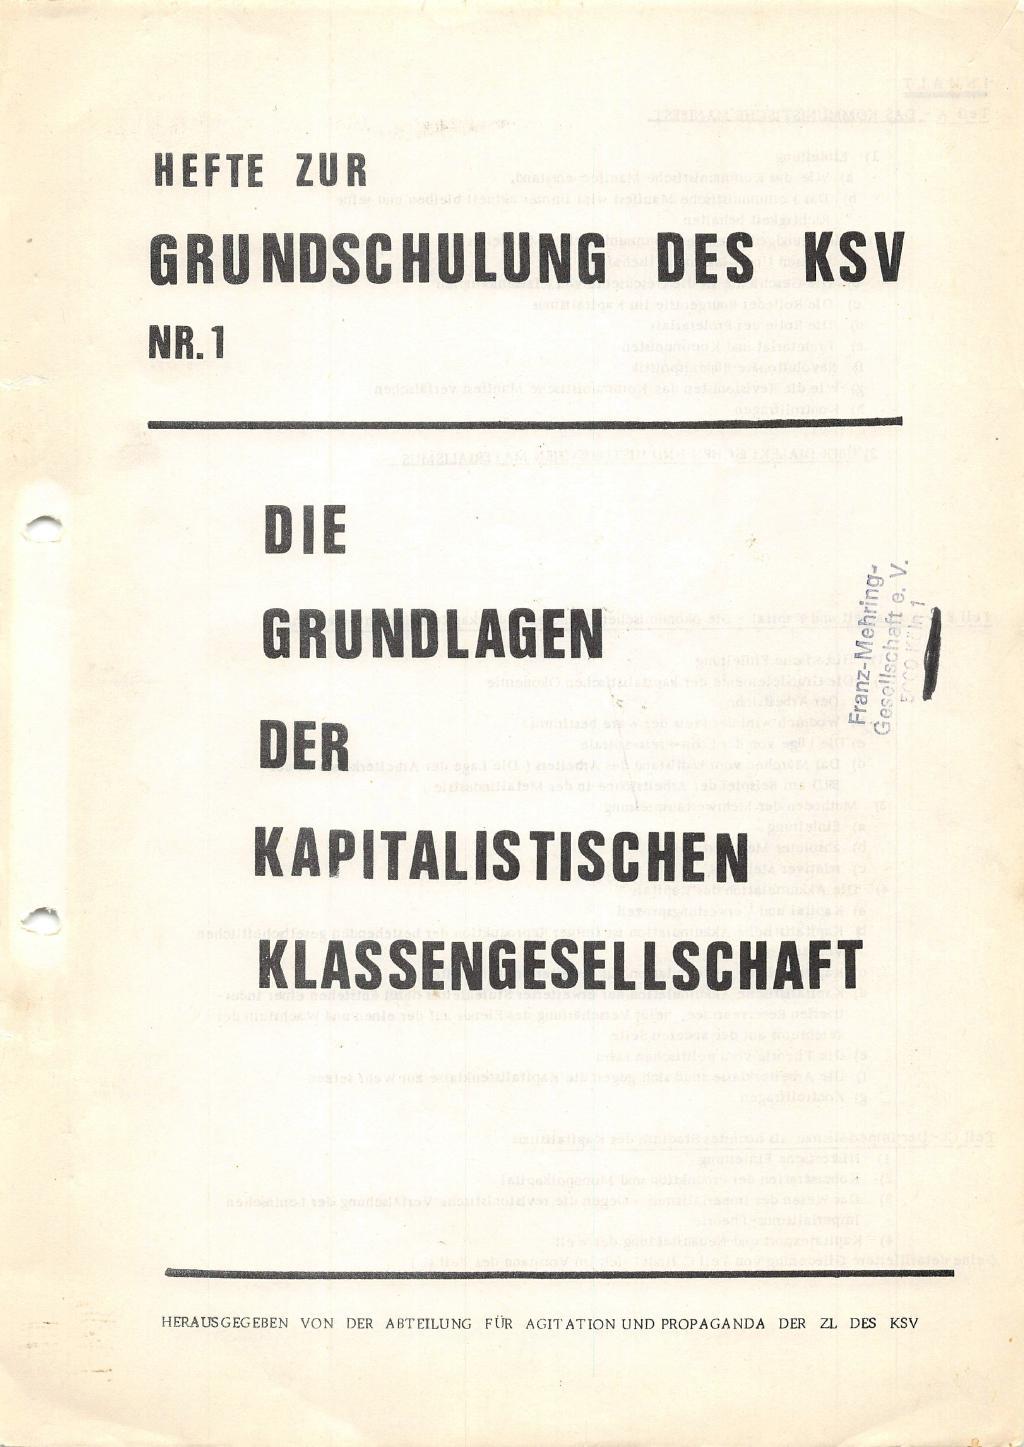 KSV_Grundschulung_1975_01_01